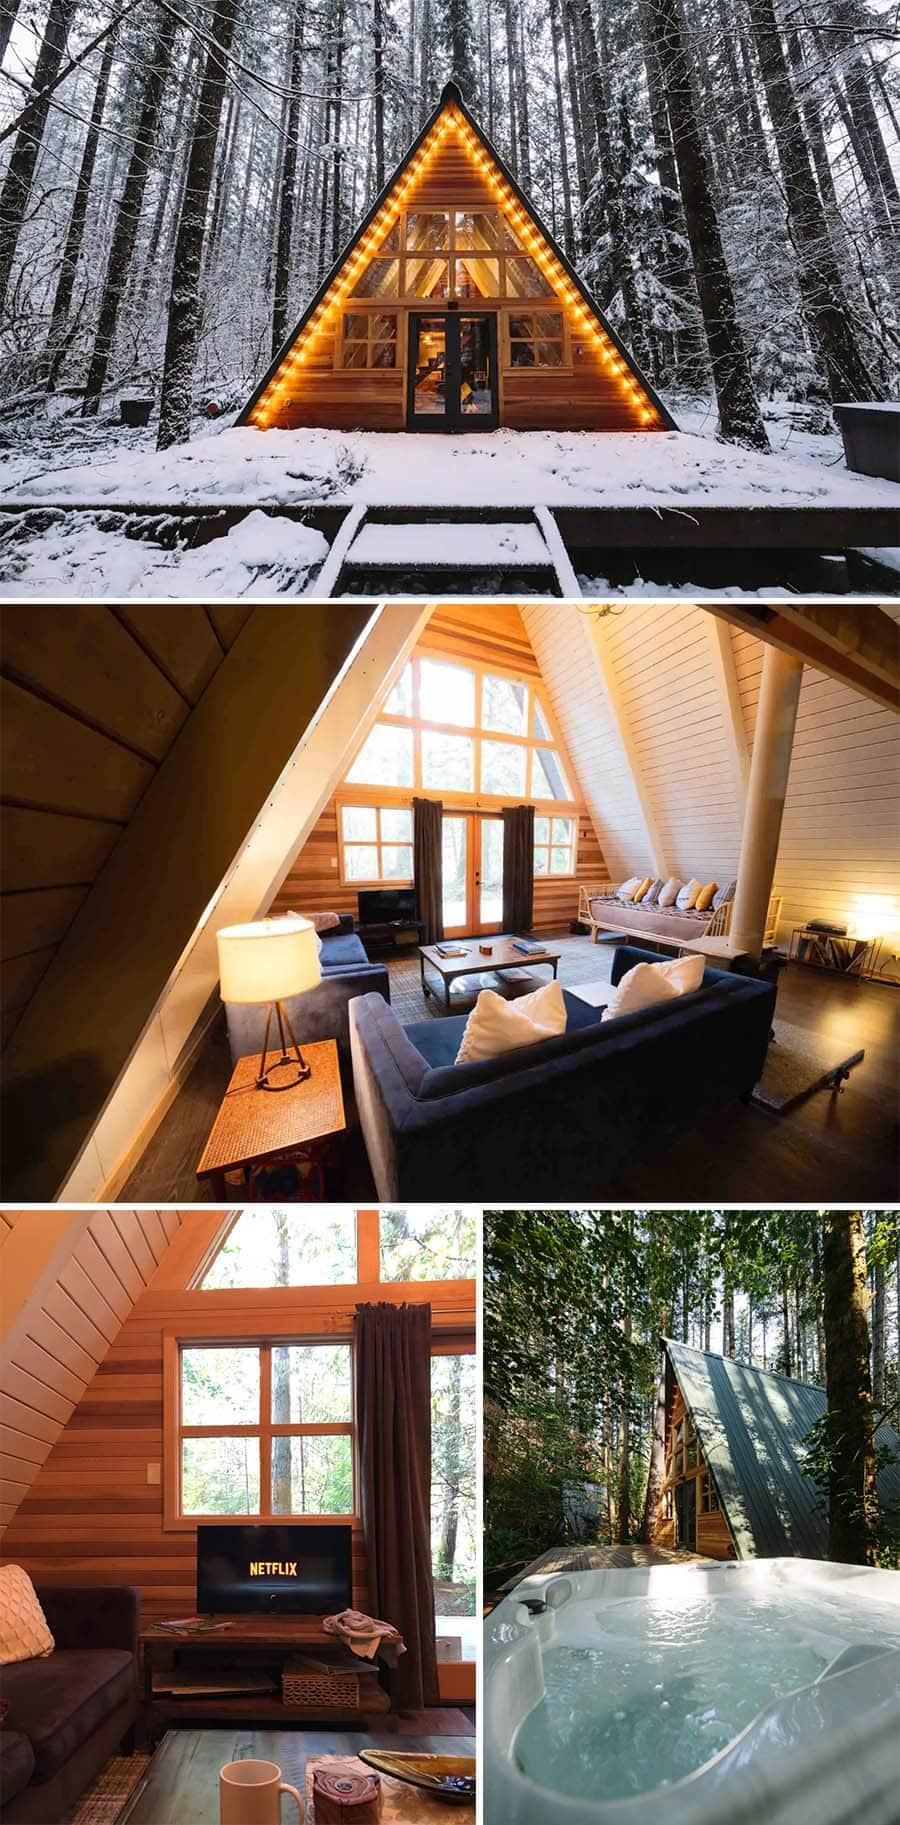 Tye-Haus A-Frame cabin Airbnbs in Skykomish, Washington